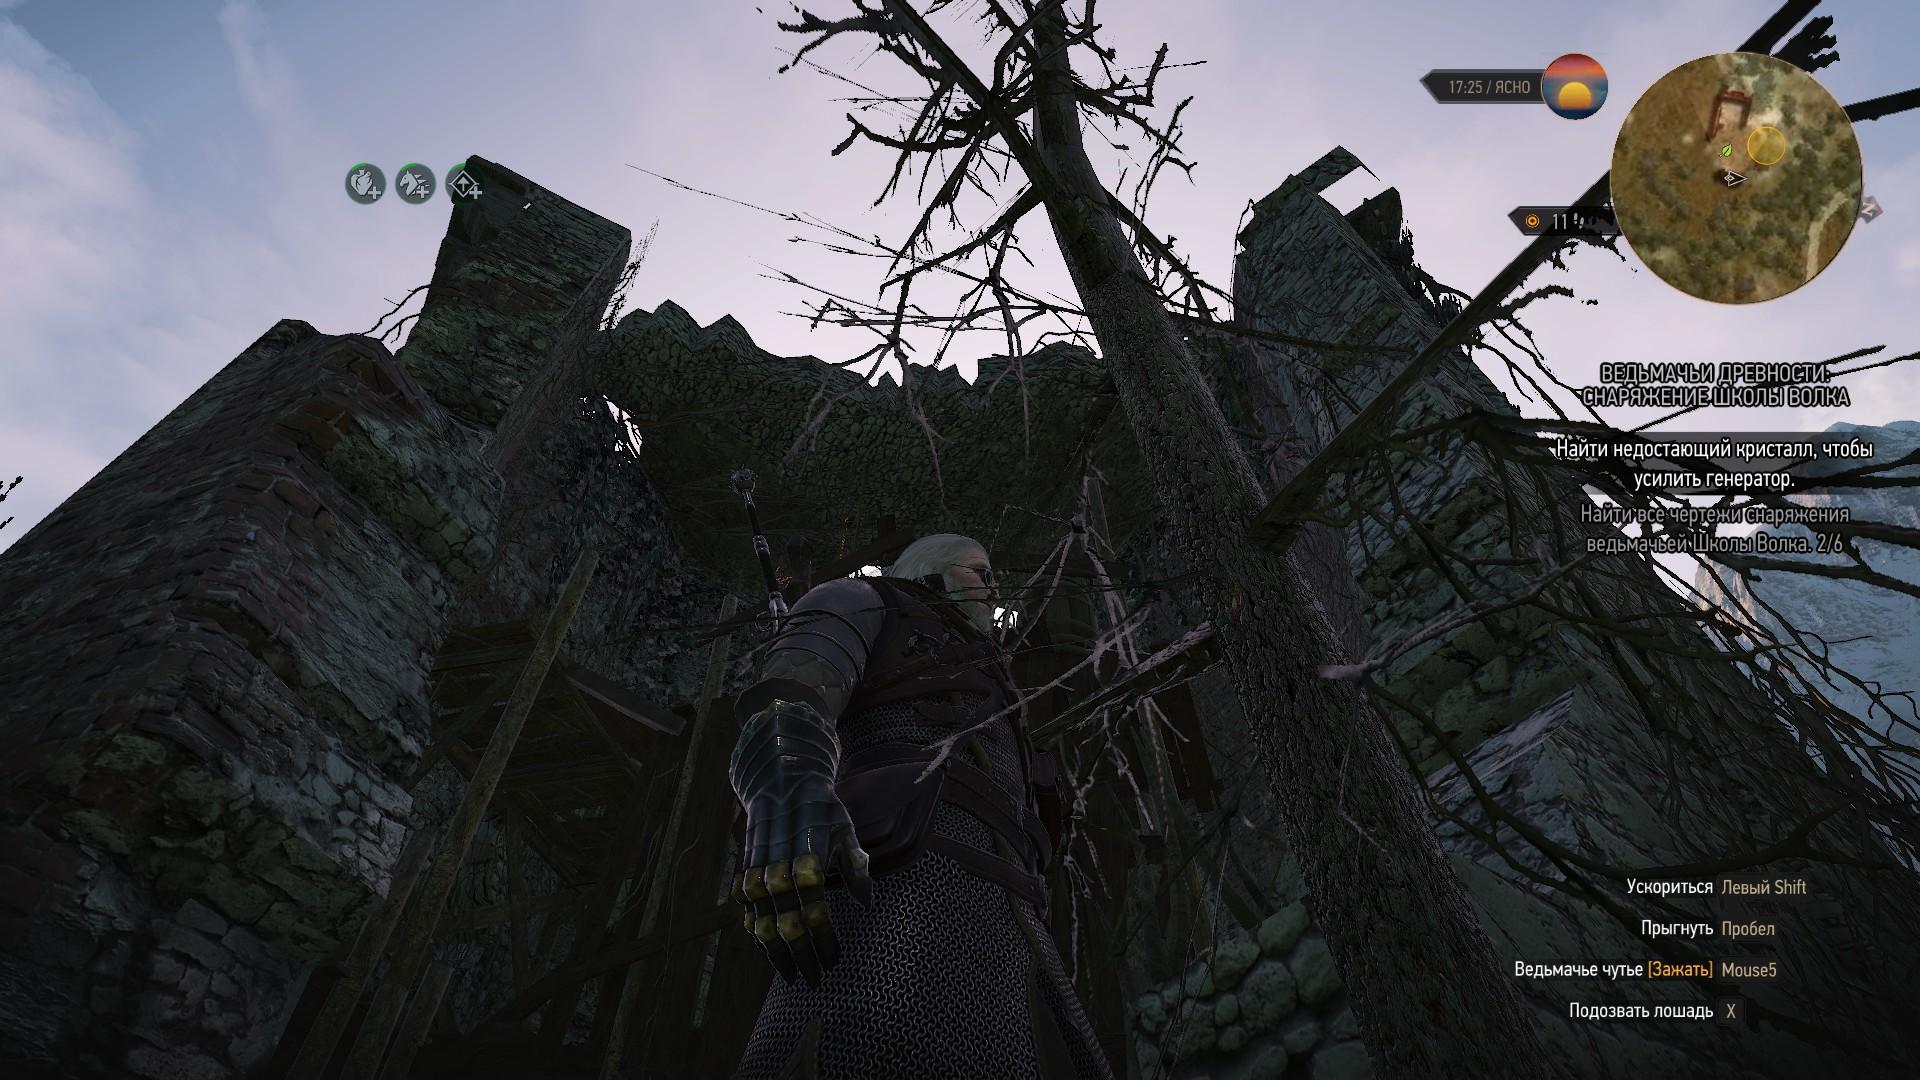 Каэр Морхен дырки в текстурах - Witcher 3: Wild Hunt, the Юмор